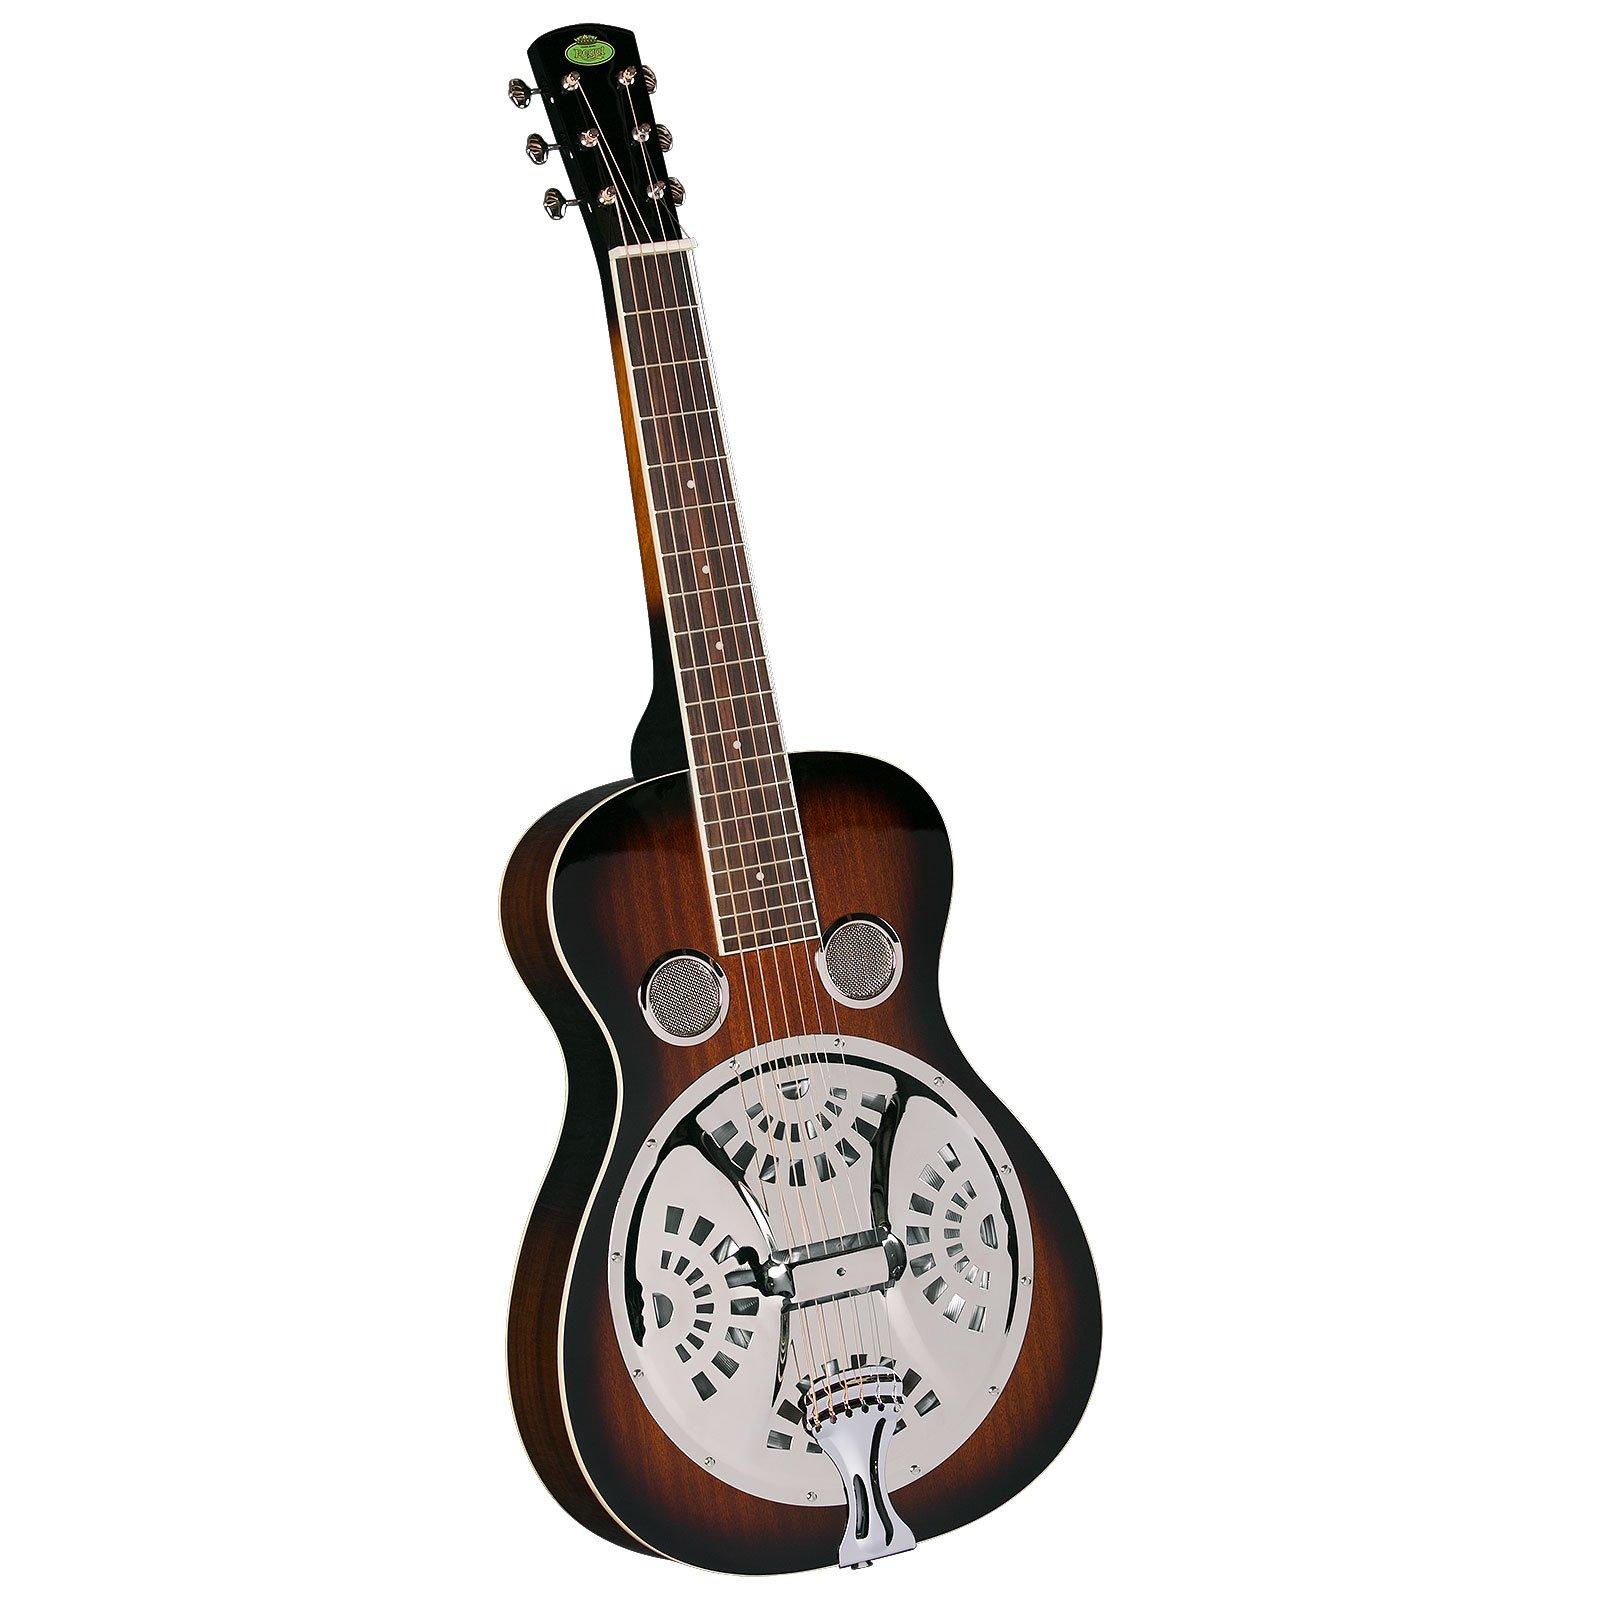 Regal RD-30TS Studio Series Squareneck Resophonic Guitar - Sunburst Mahogany